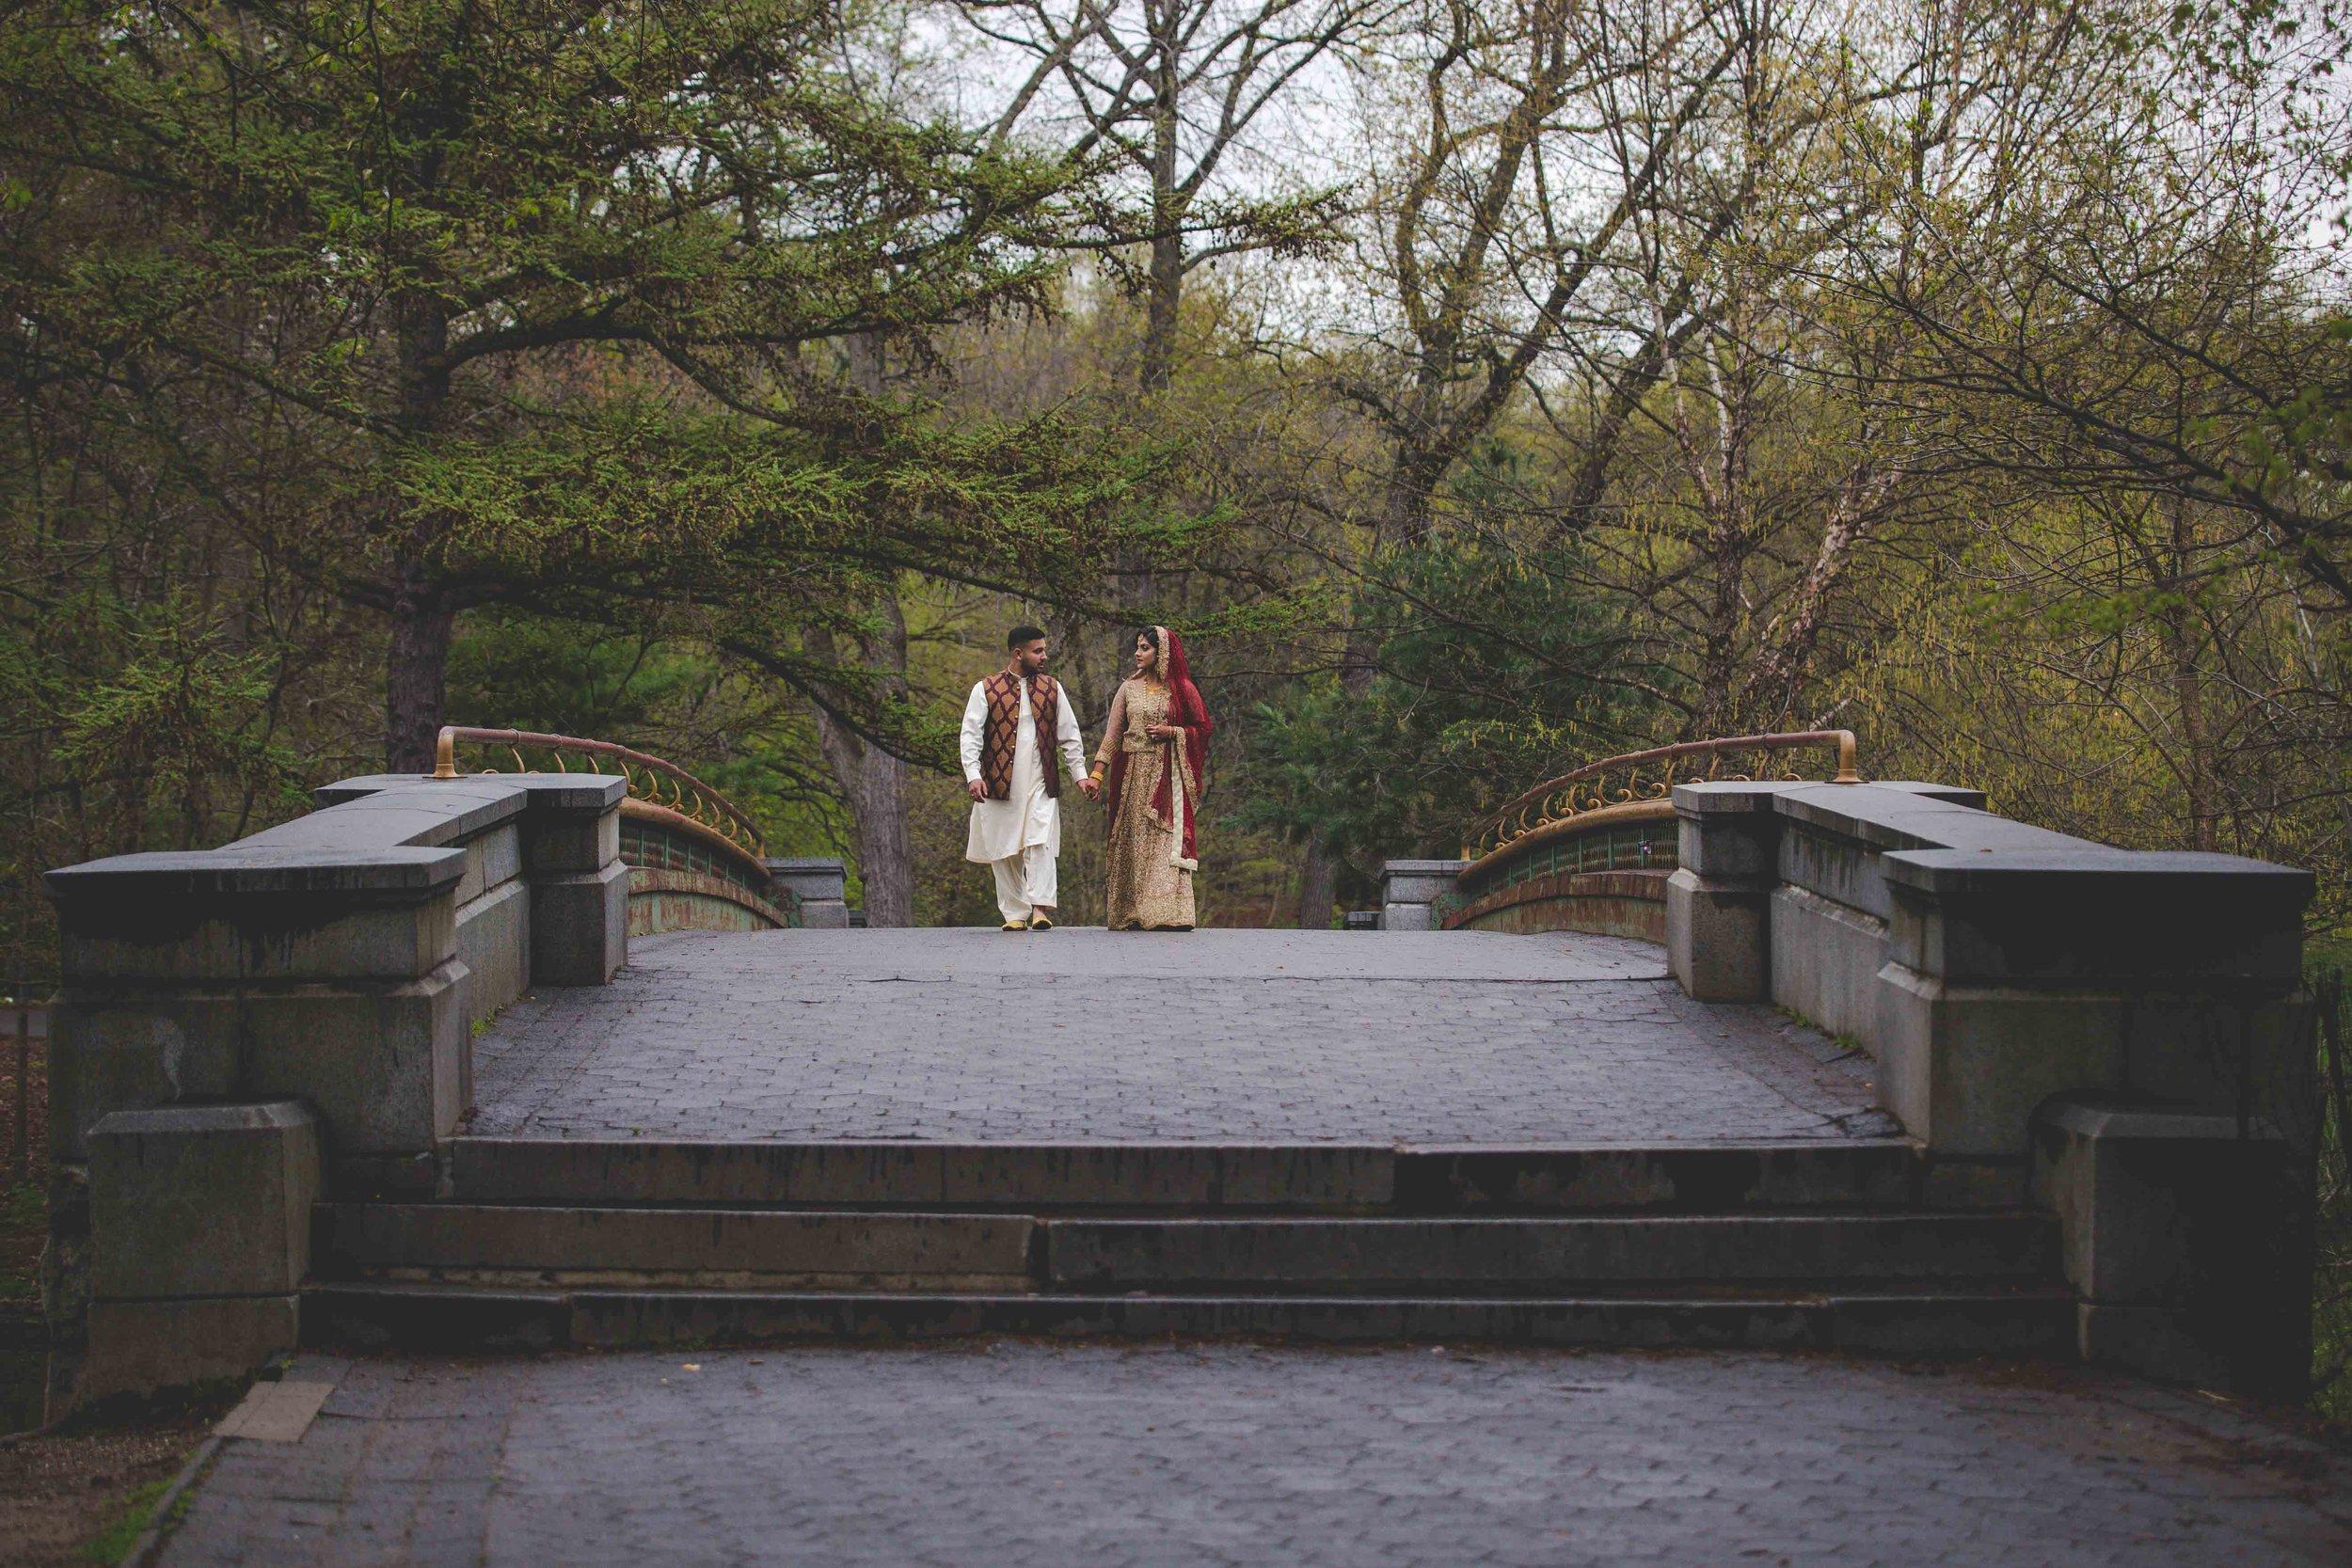 pakistani-wedding-photographer-brooklyn-new-york-48.jpg